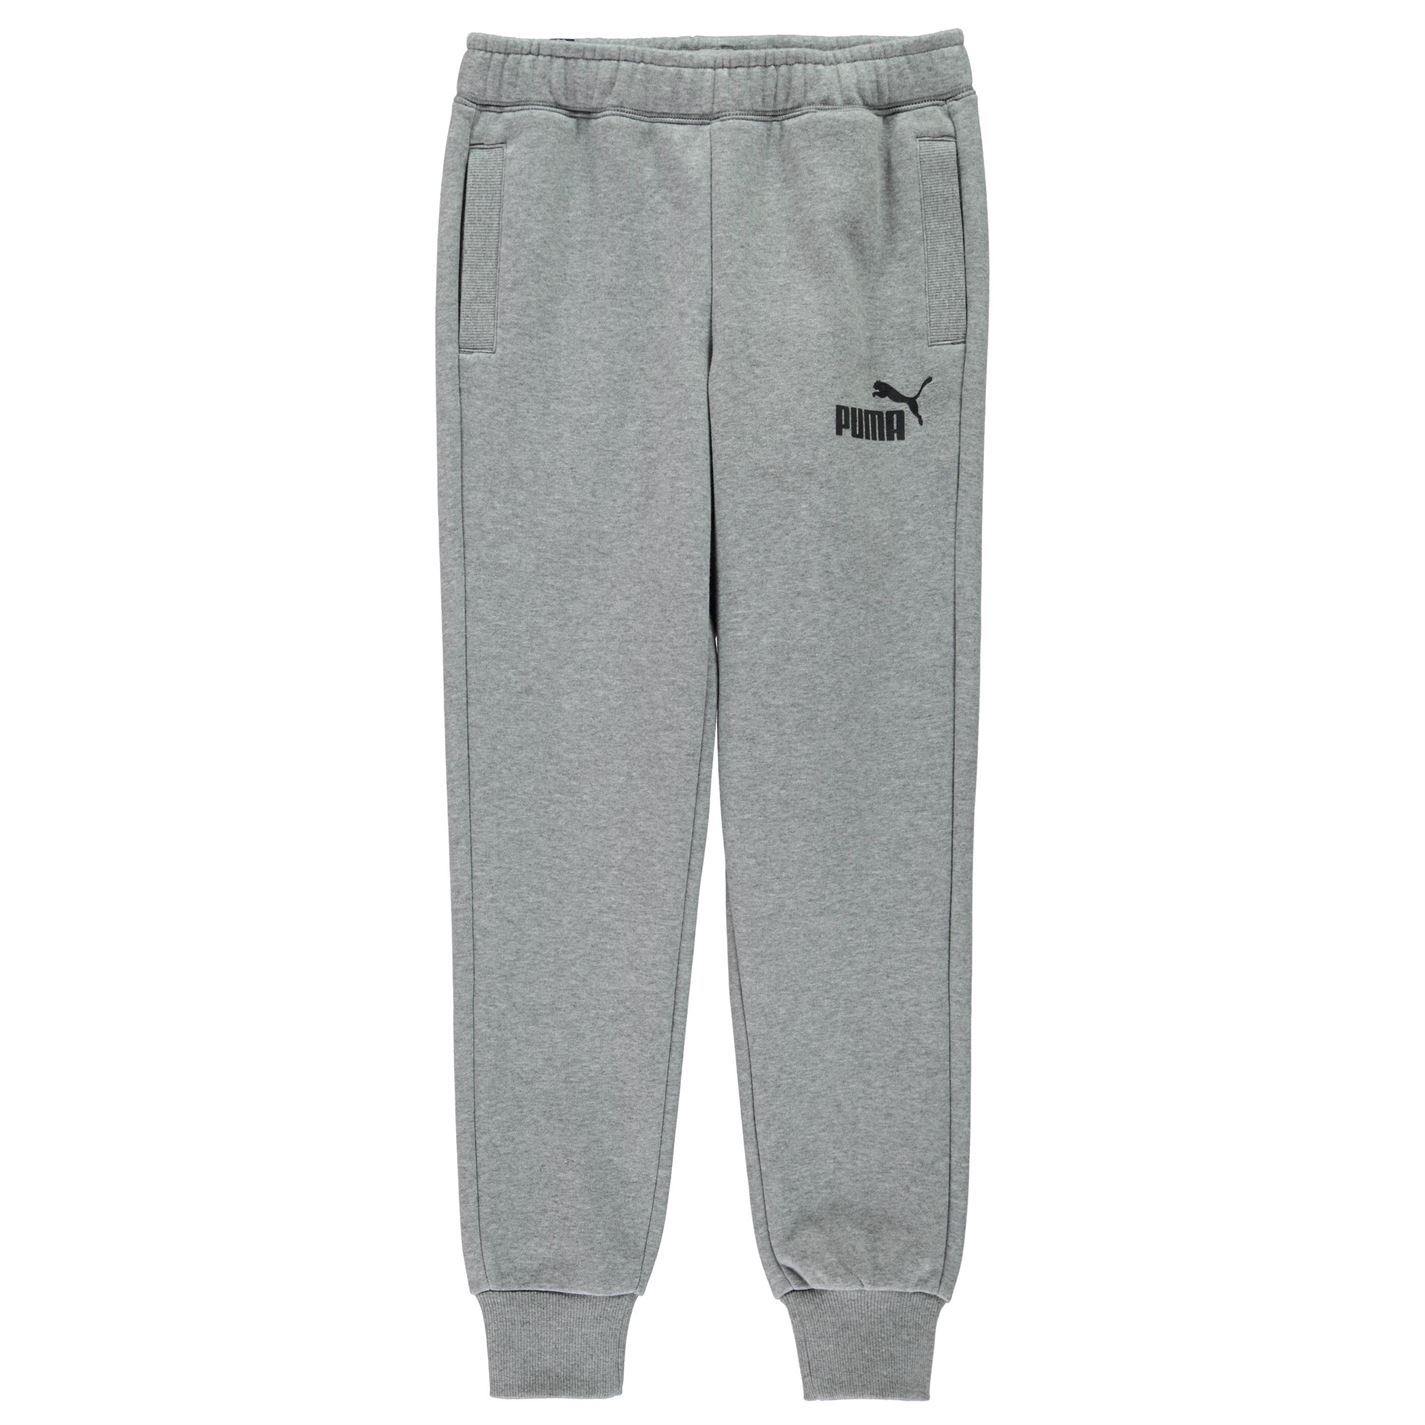 PUMA Boys Tapered Fleece Pants Childrens Running Clothing Grey 9 10